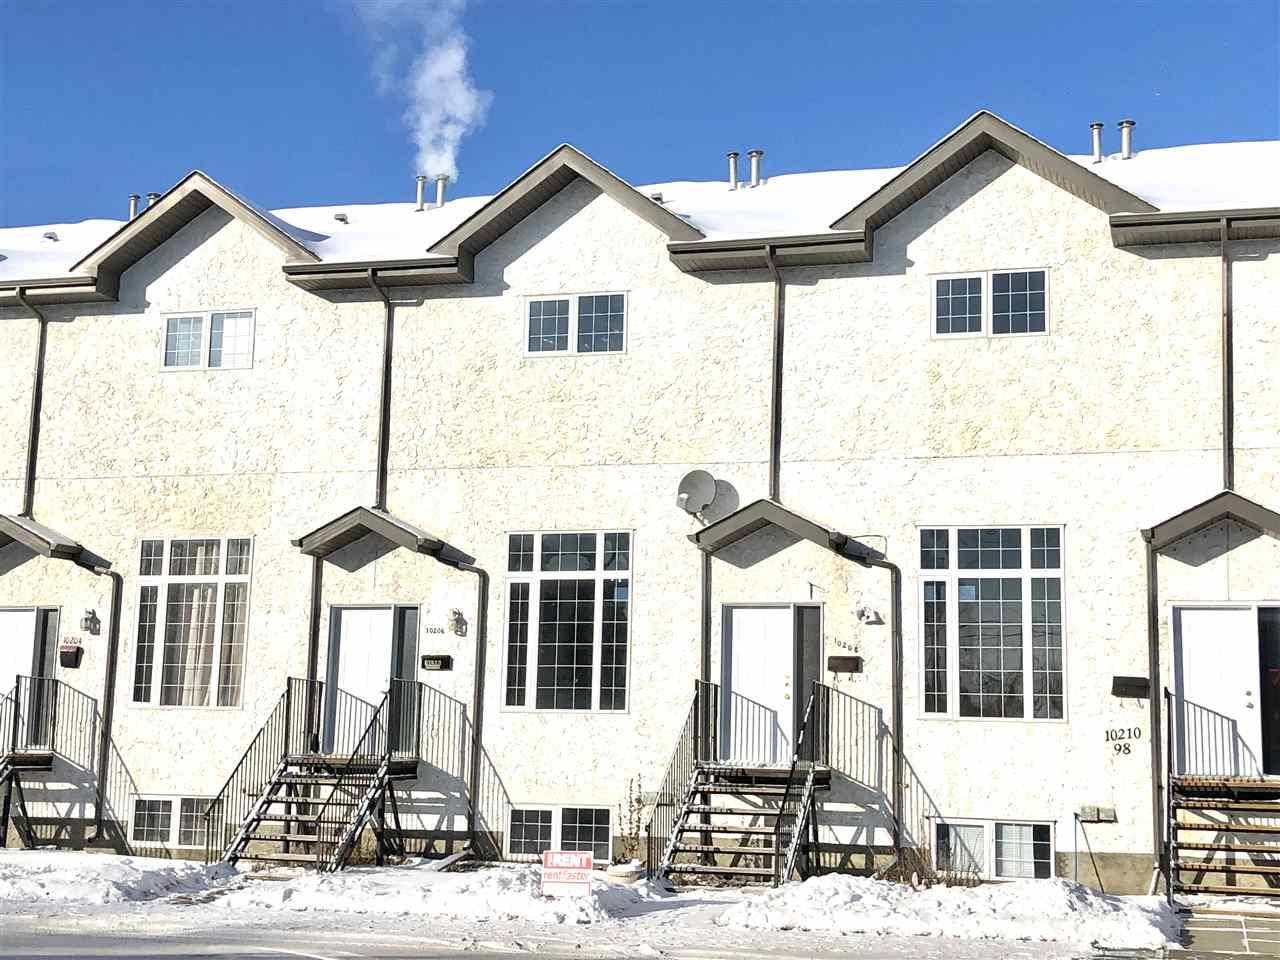 10208 98 avenue, fort saskatchewan for sale 229,700 zolo.ca